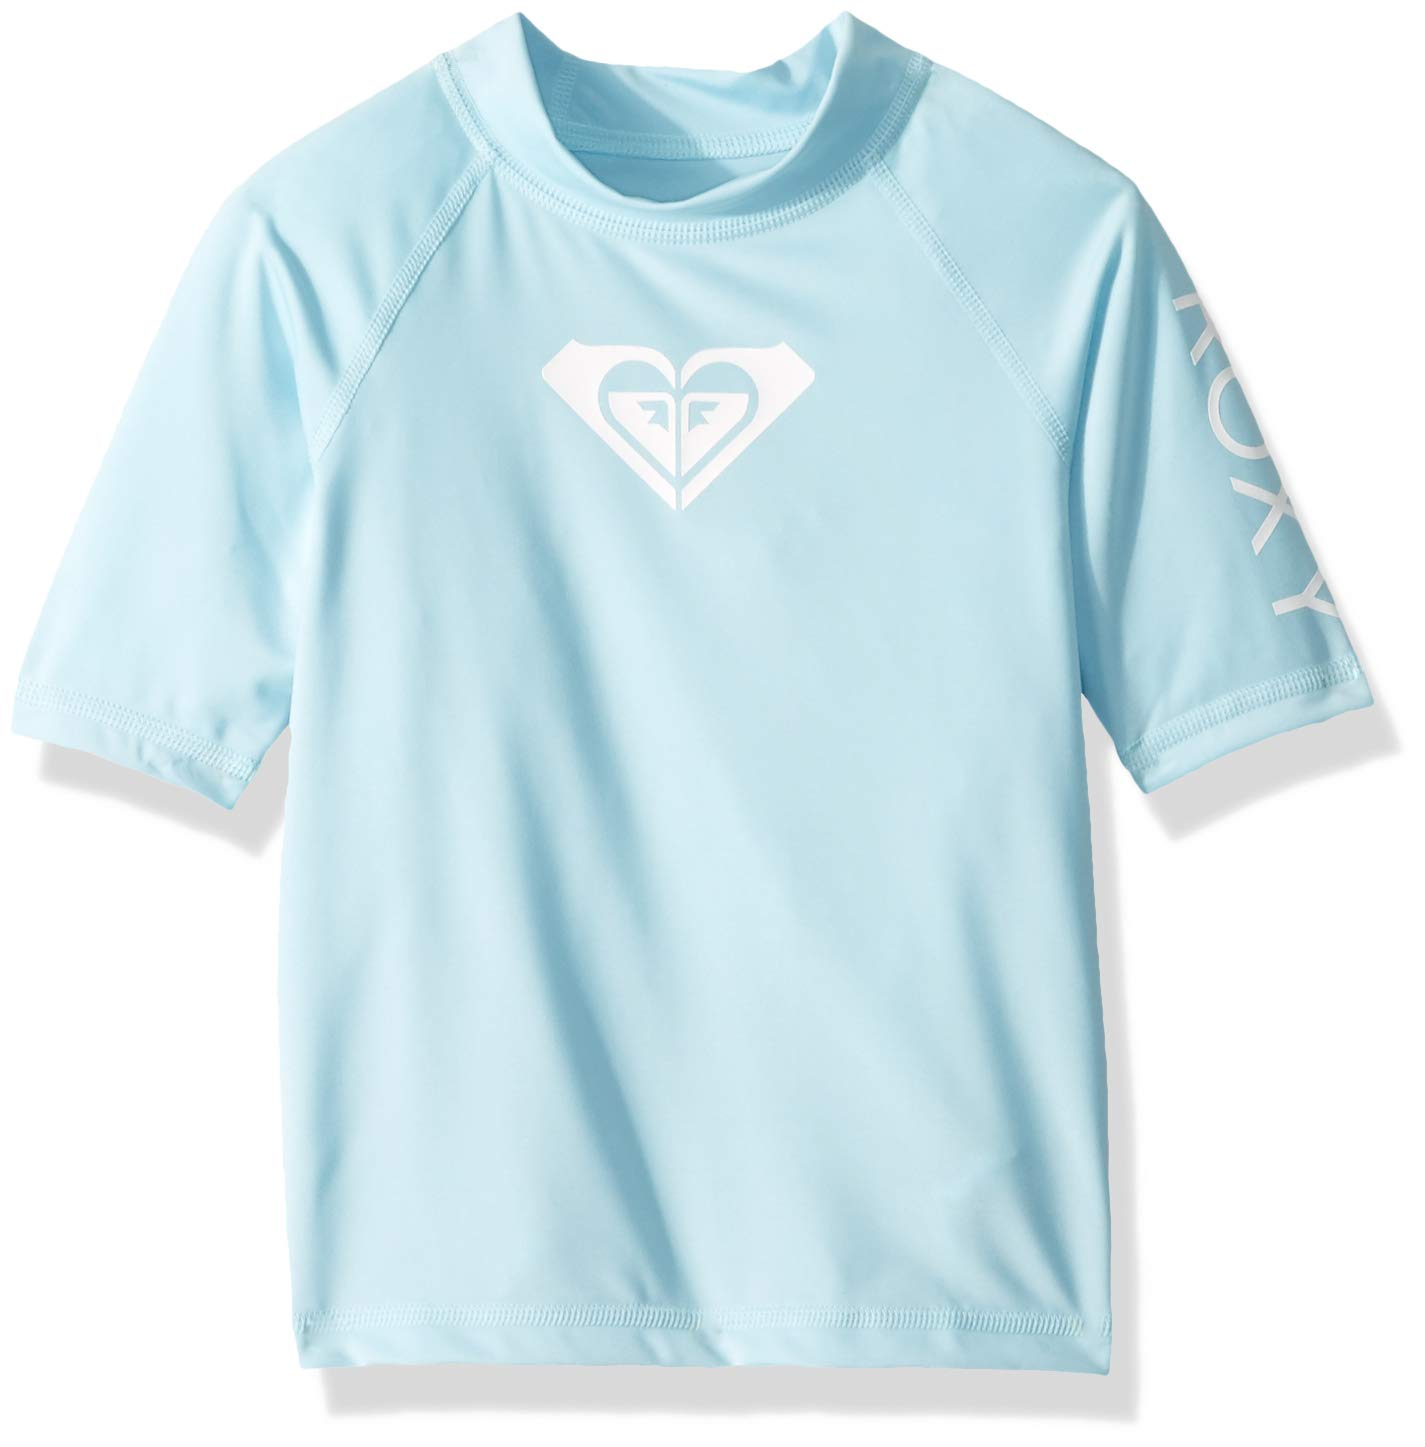 Roxy Toddler Girls' Whole Hearted Short Sleeve Rashguard, Crystal Blue, 2